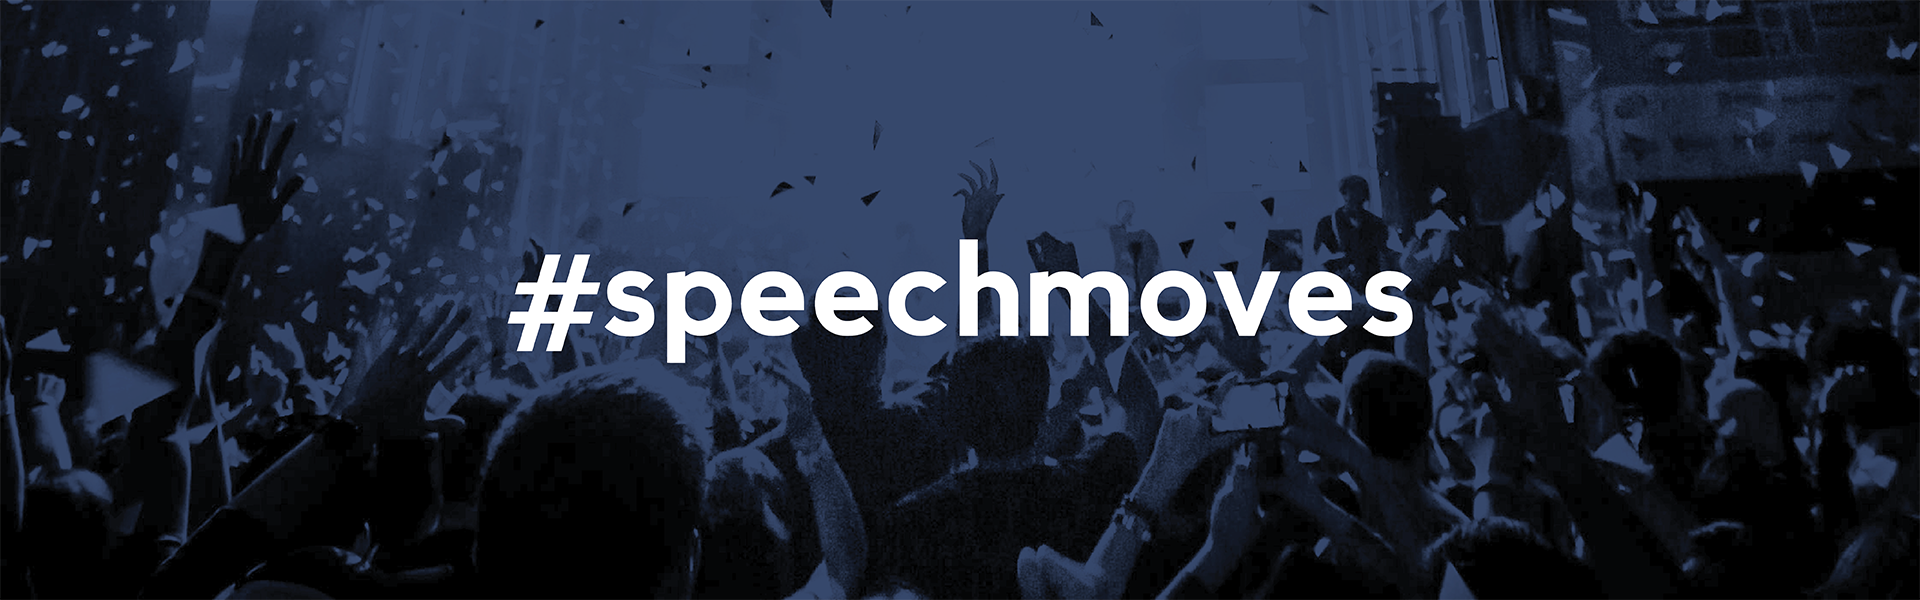 SpeechMoves_LandingPage_image